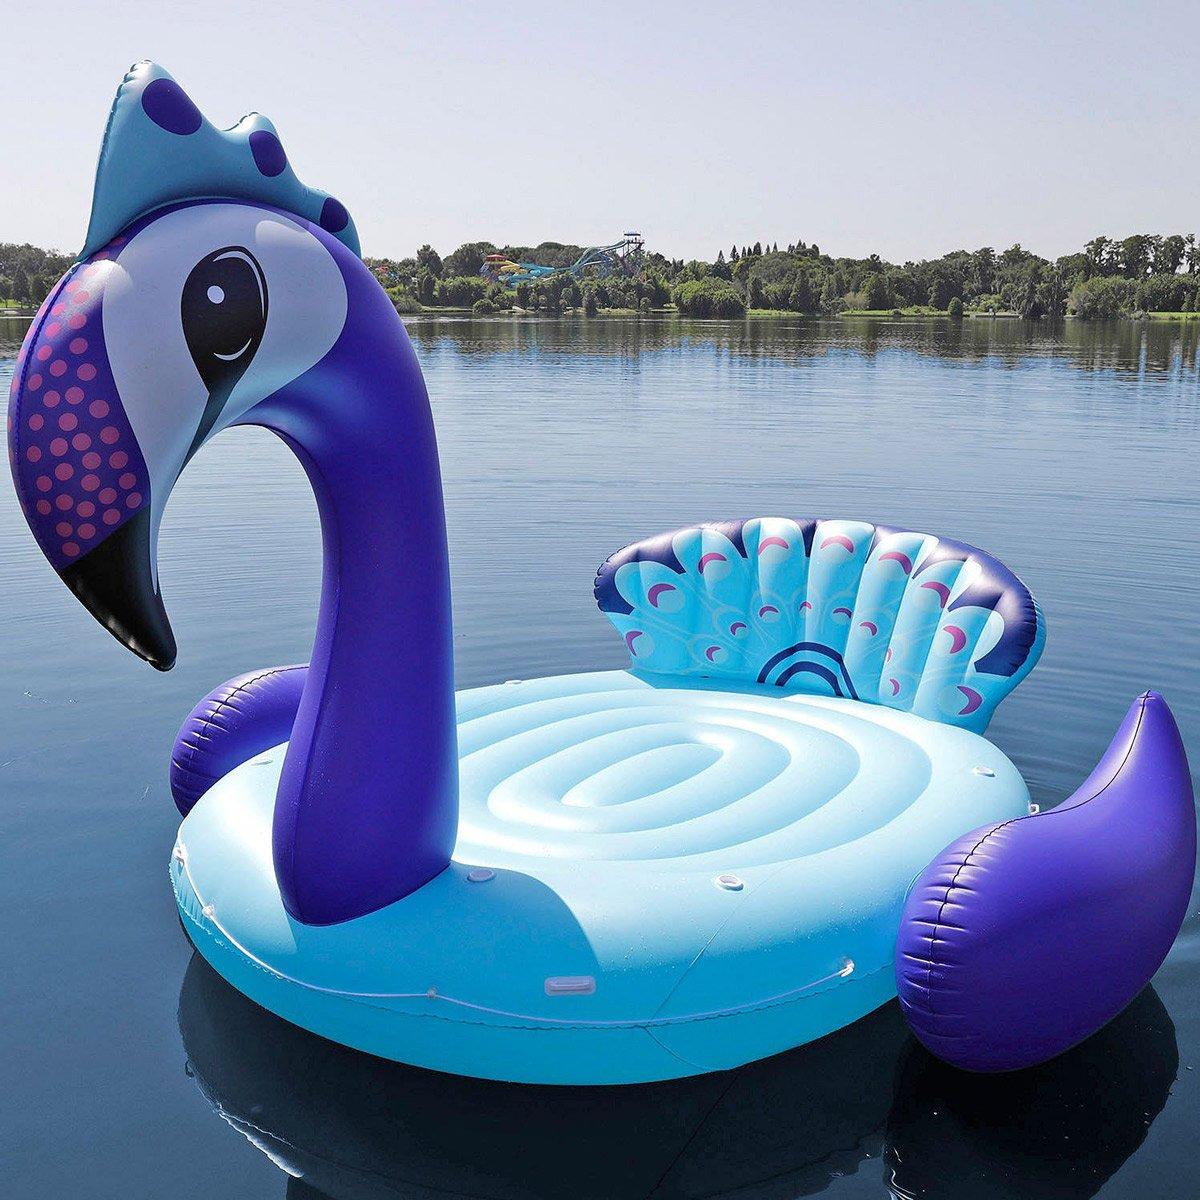 Massive Inflatable Party Bird Island